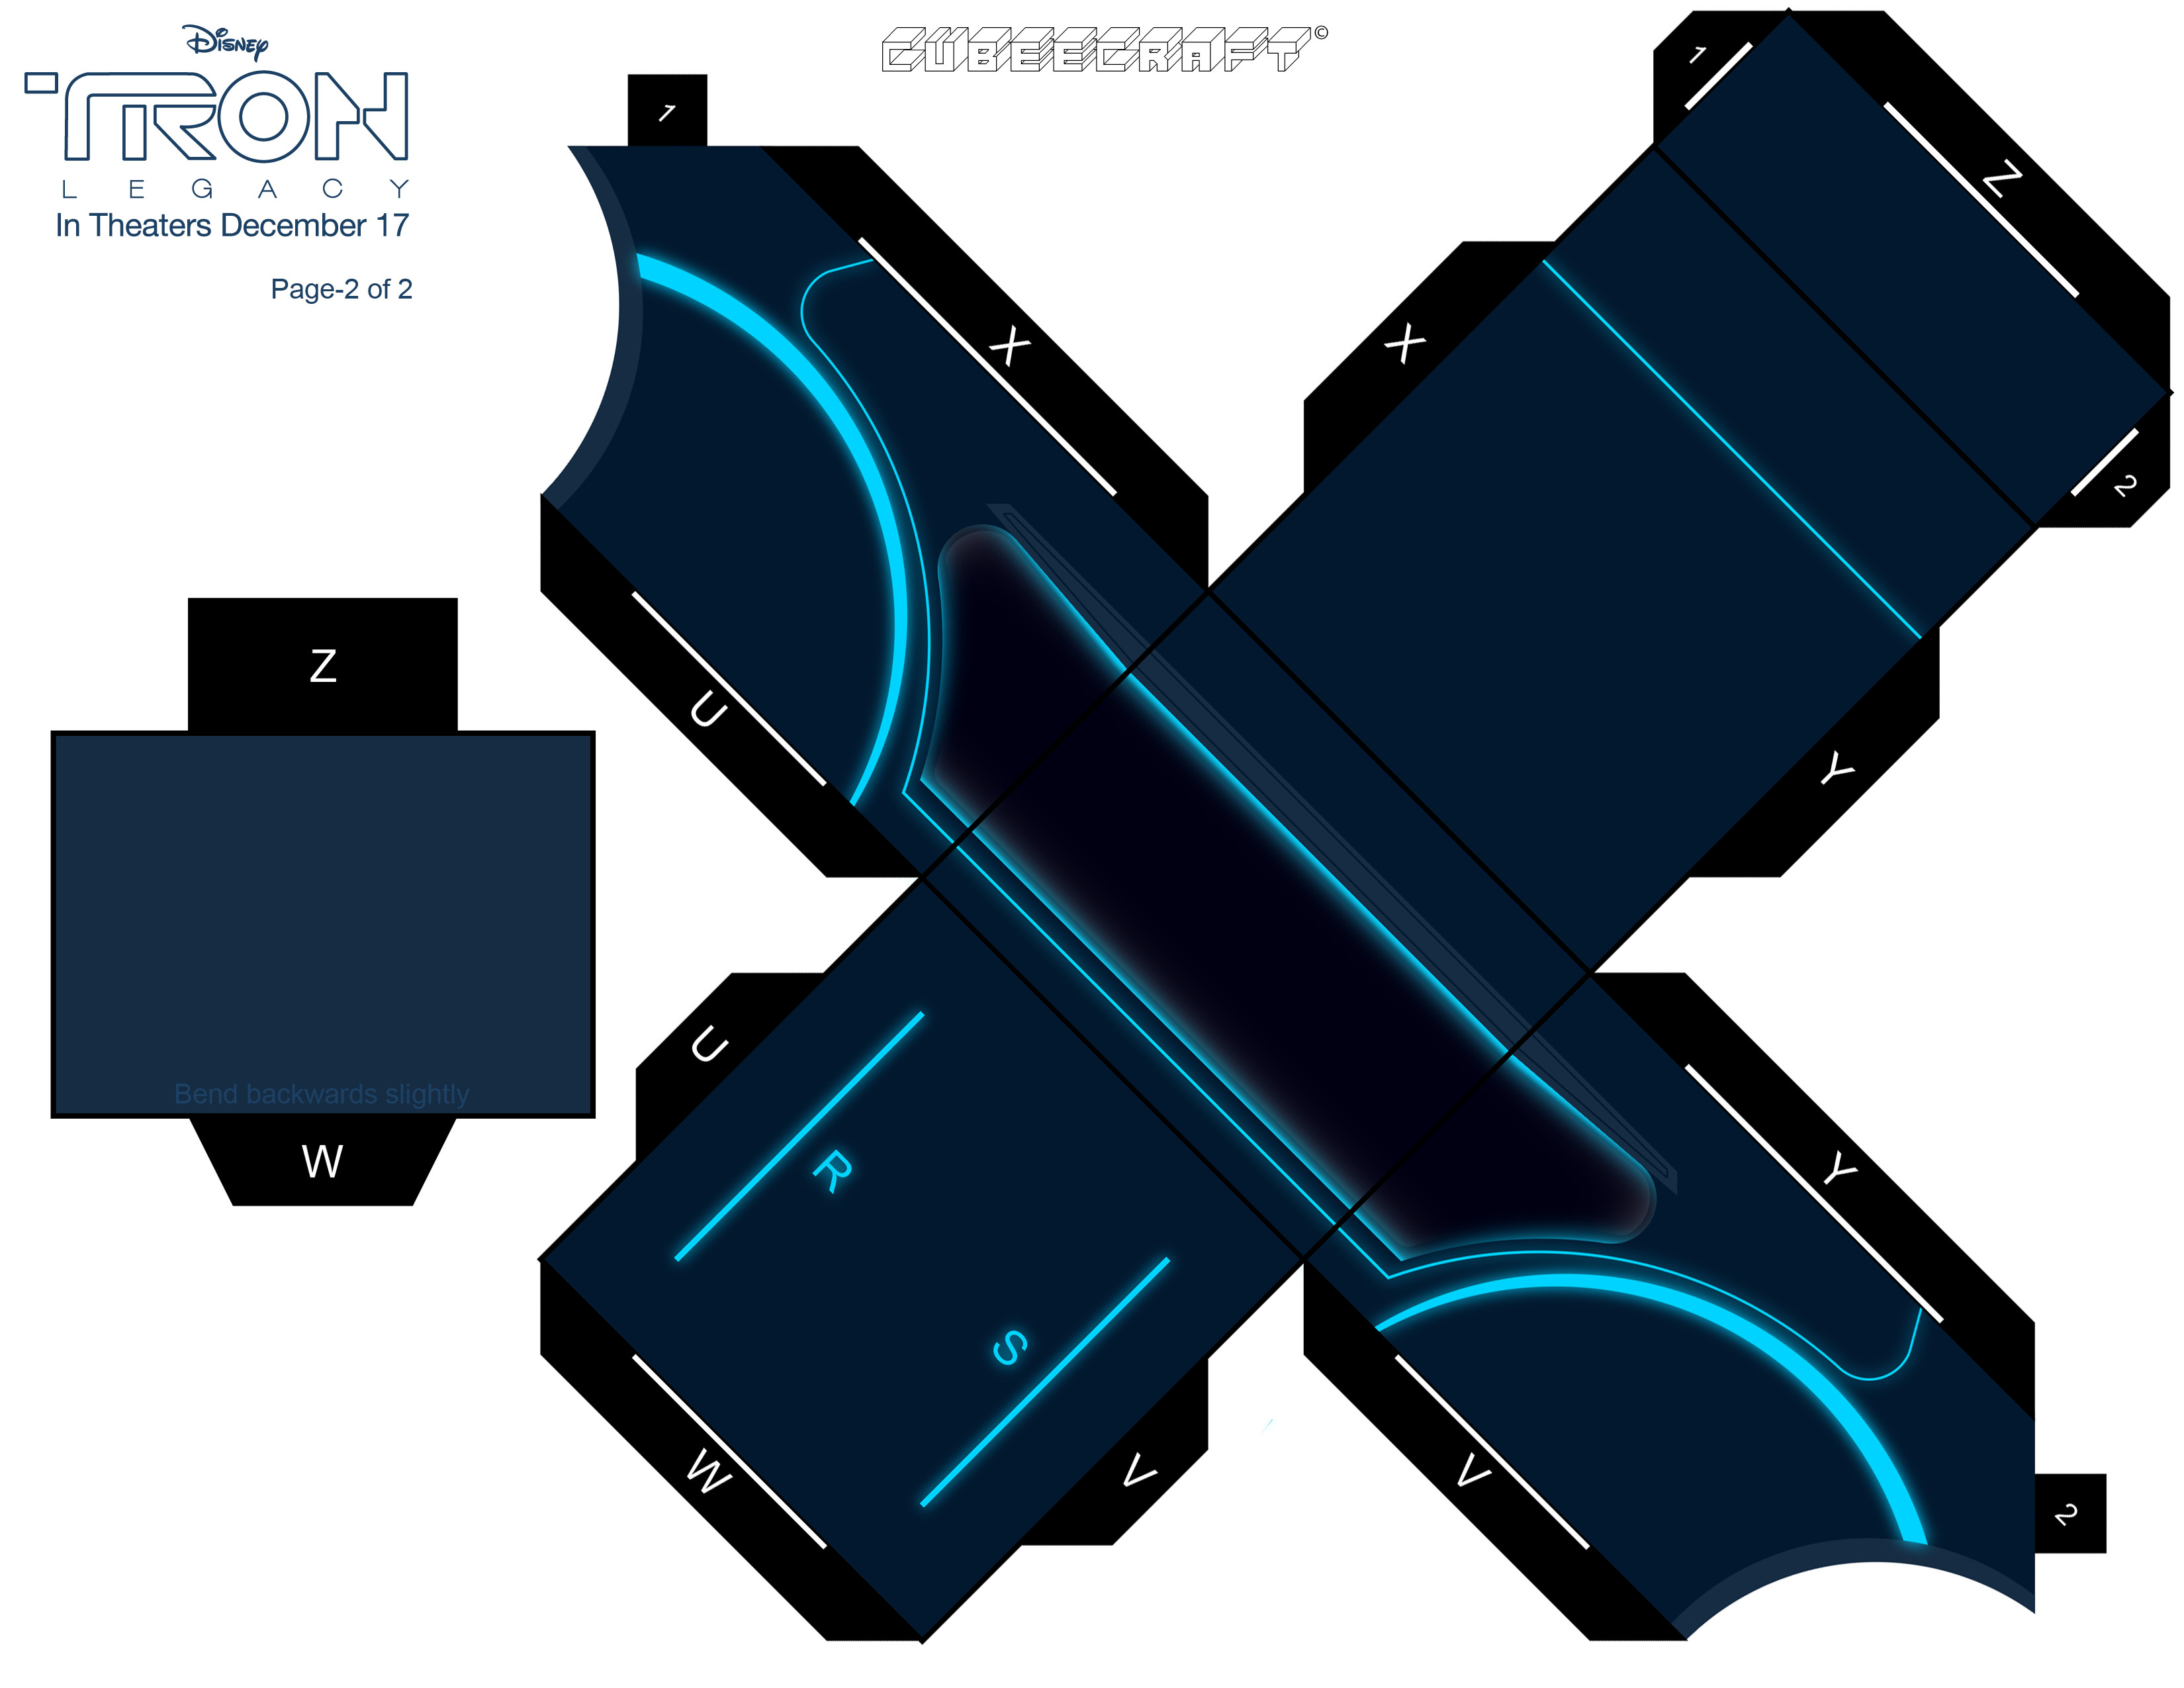 XL cubeecraft TRON LEGACY pt2 by randyfivesix